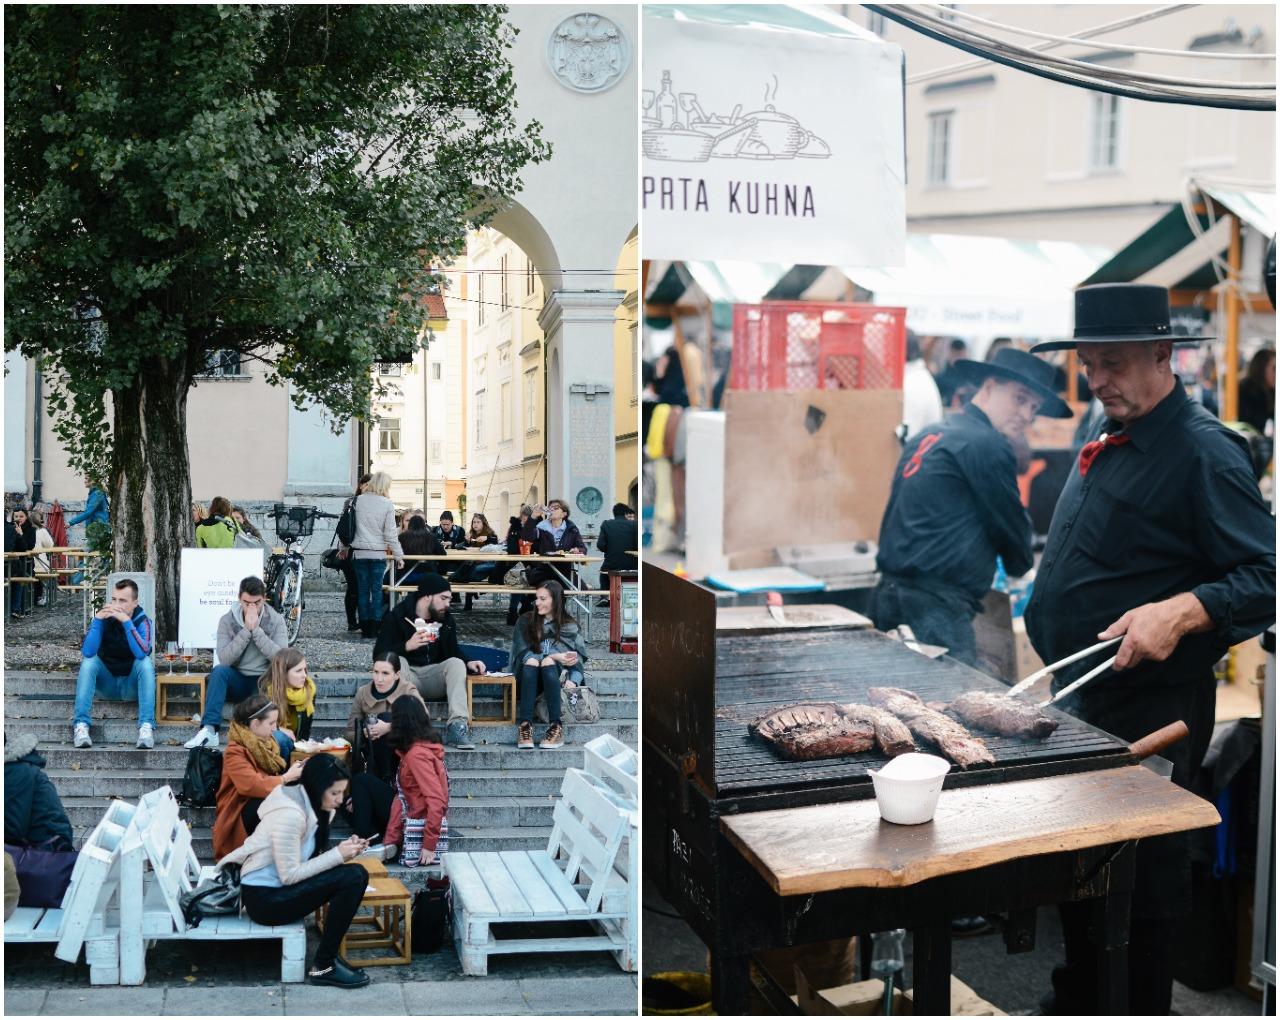 4-reasons-to-love-lljubljana-2.jpg